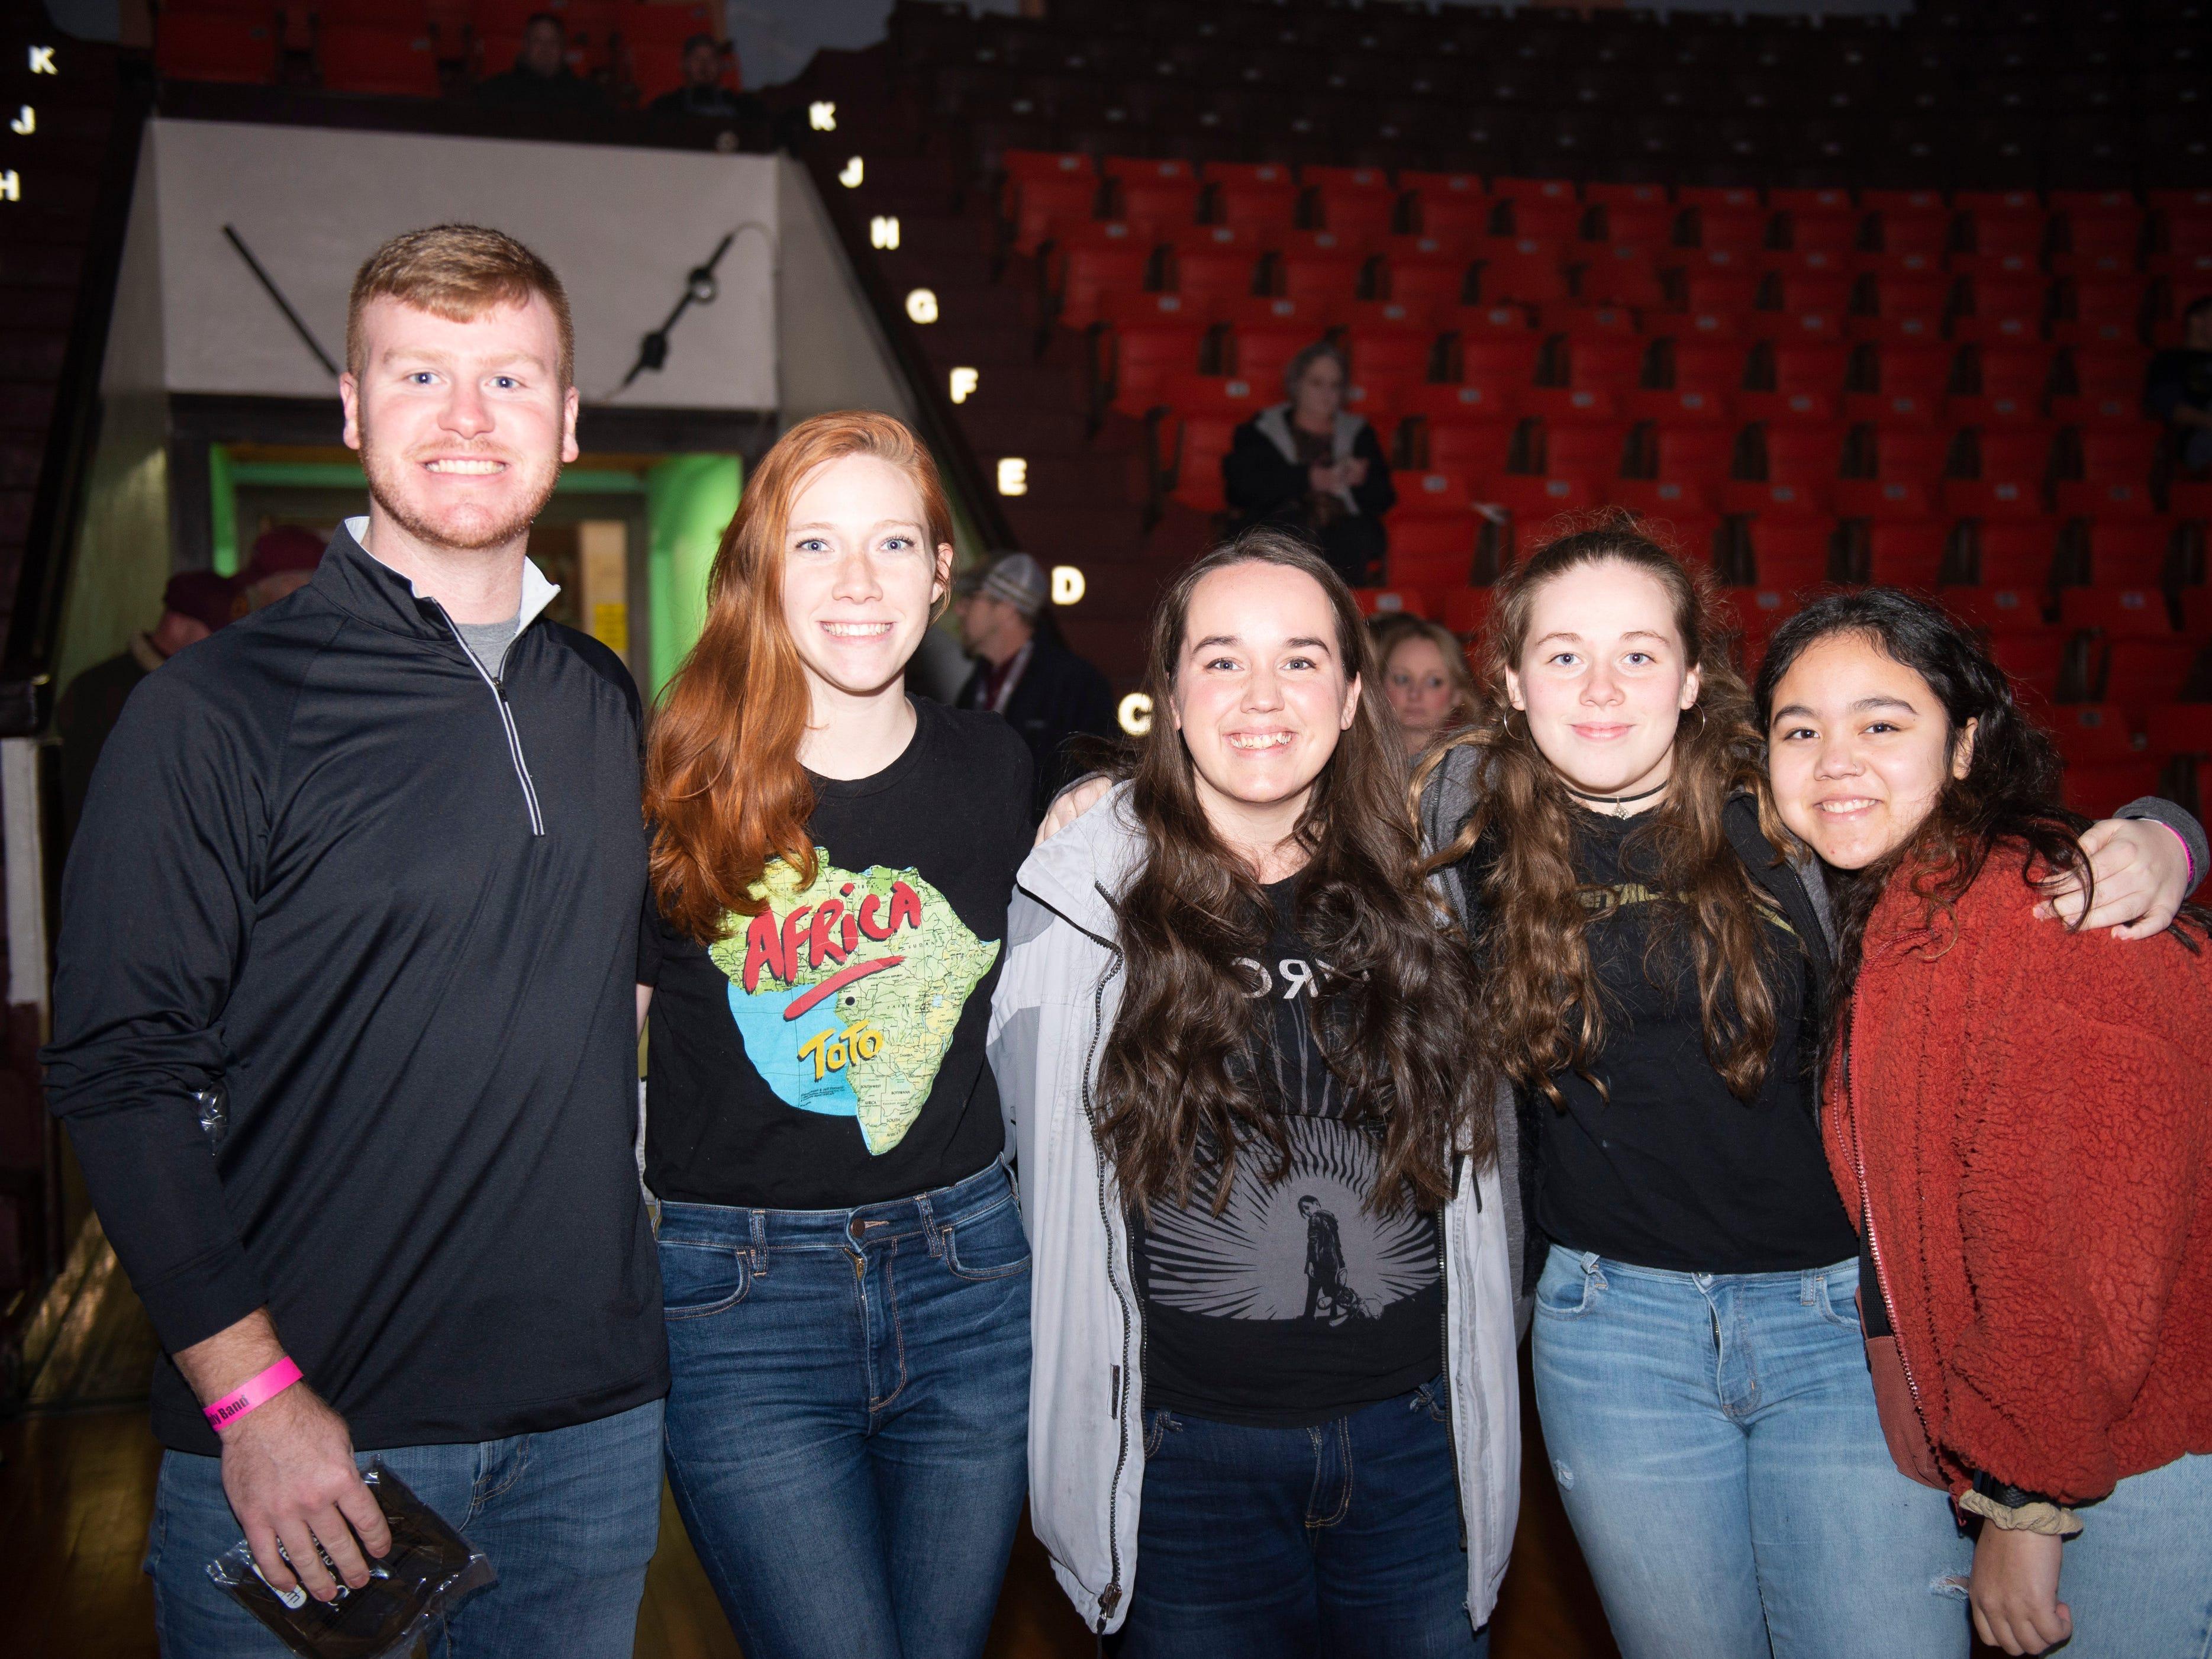 Jordan Yockey, Shelby Cuthbert, Nikki Hanson, Layla Hanson, Maya Polight